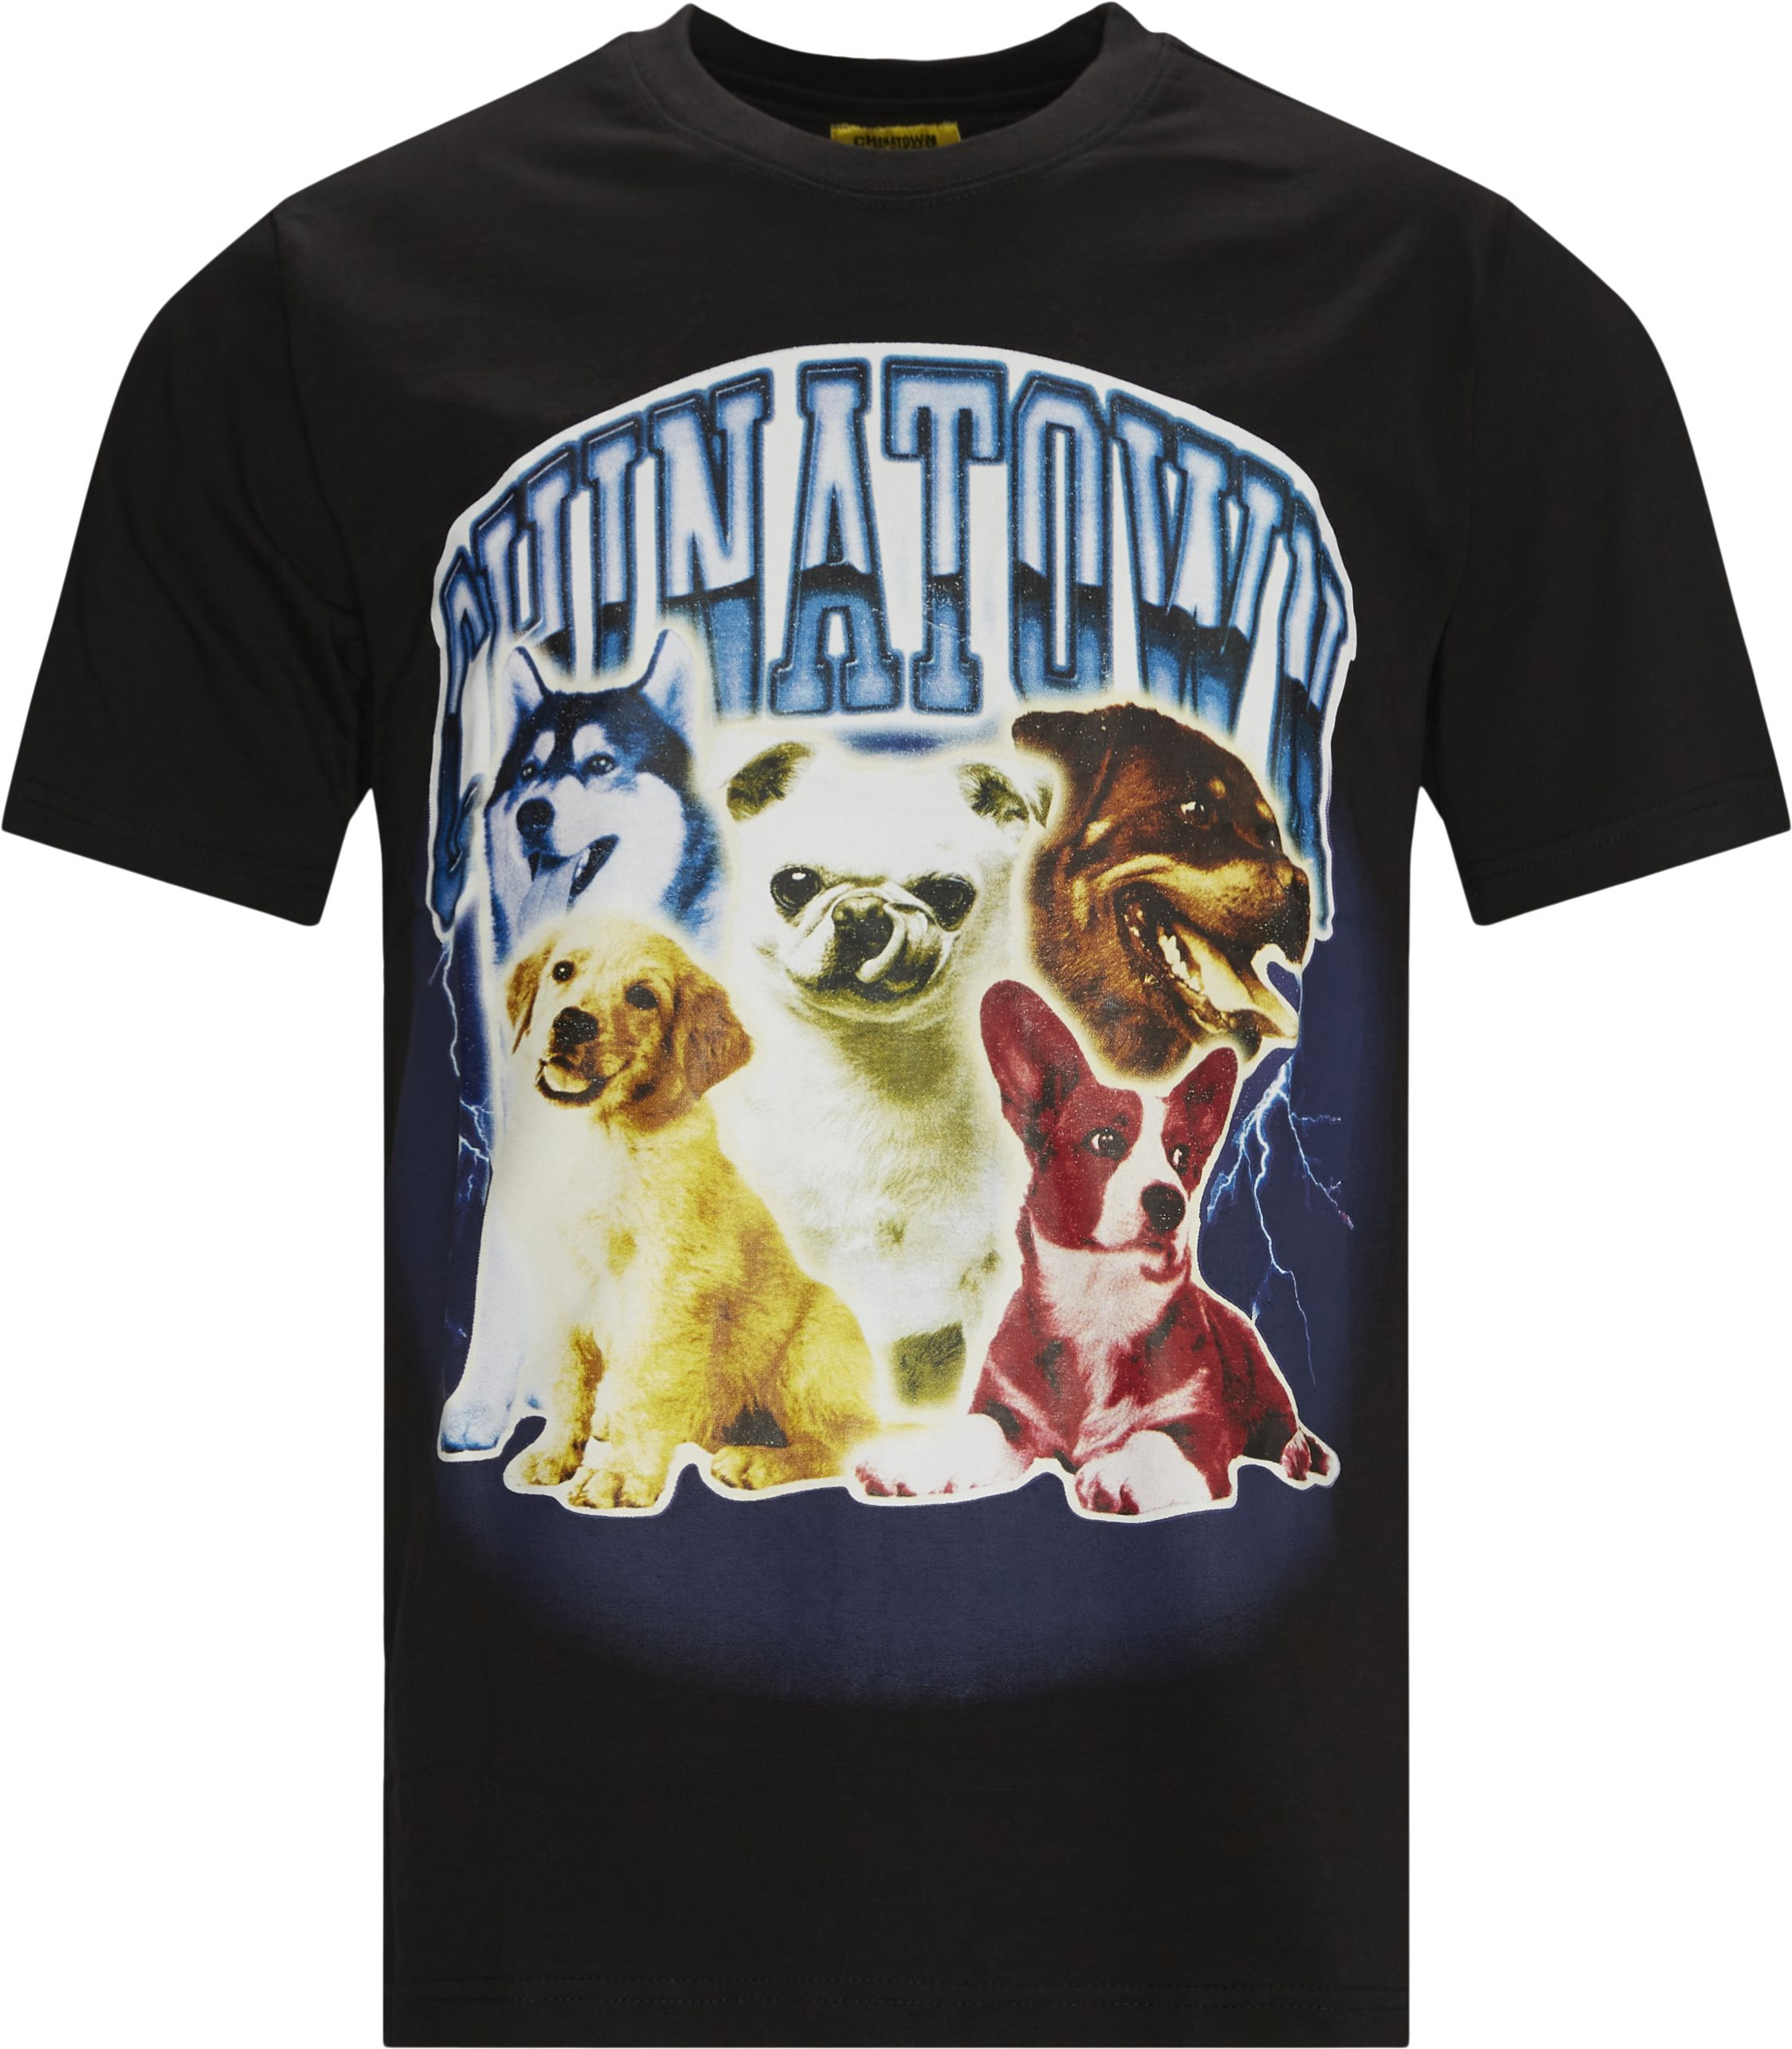 DAWG LIGHTNING t-shirt - T-shirts - Regular fit - Sort